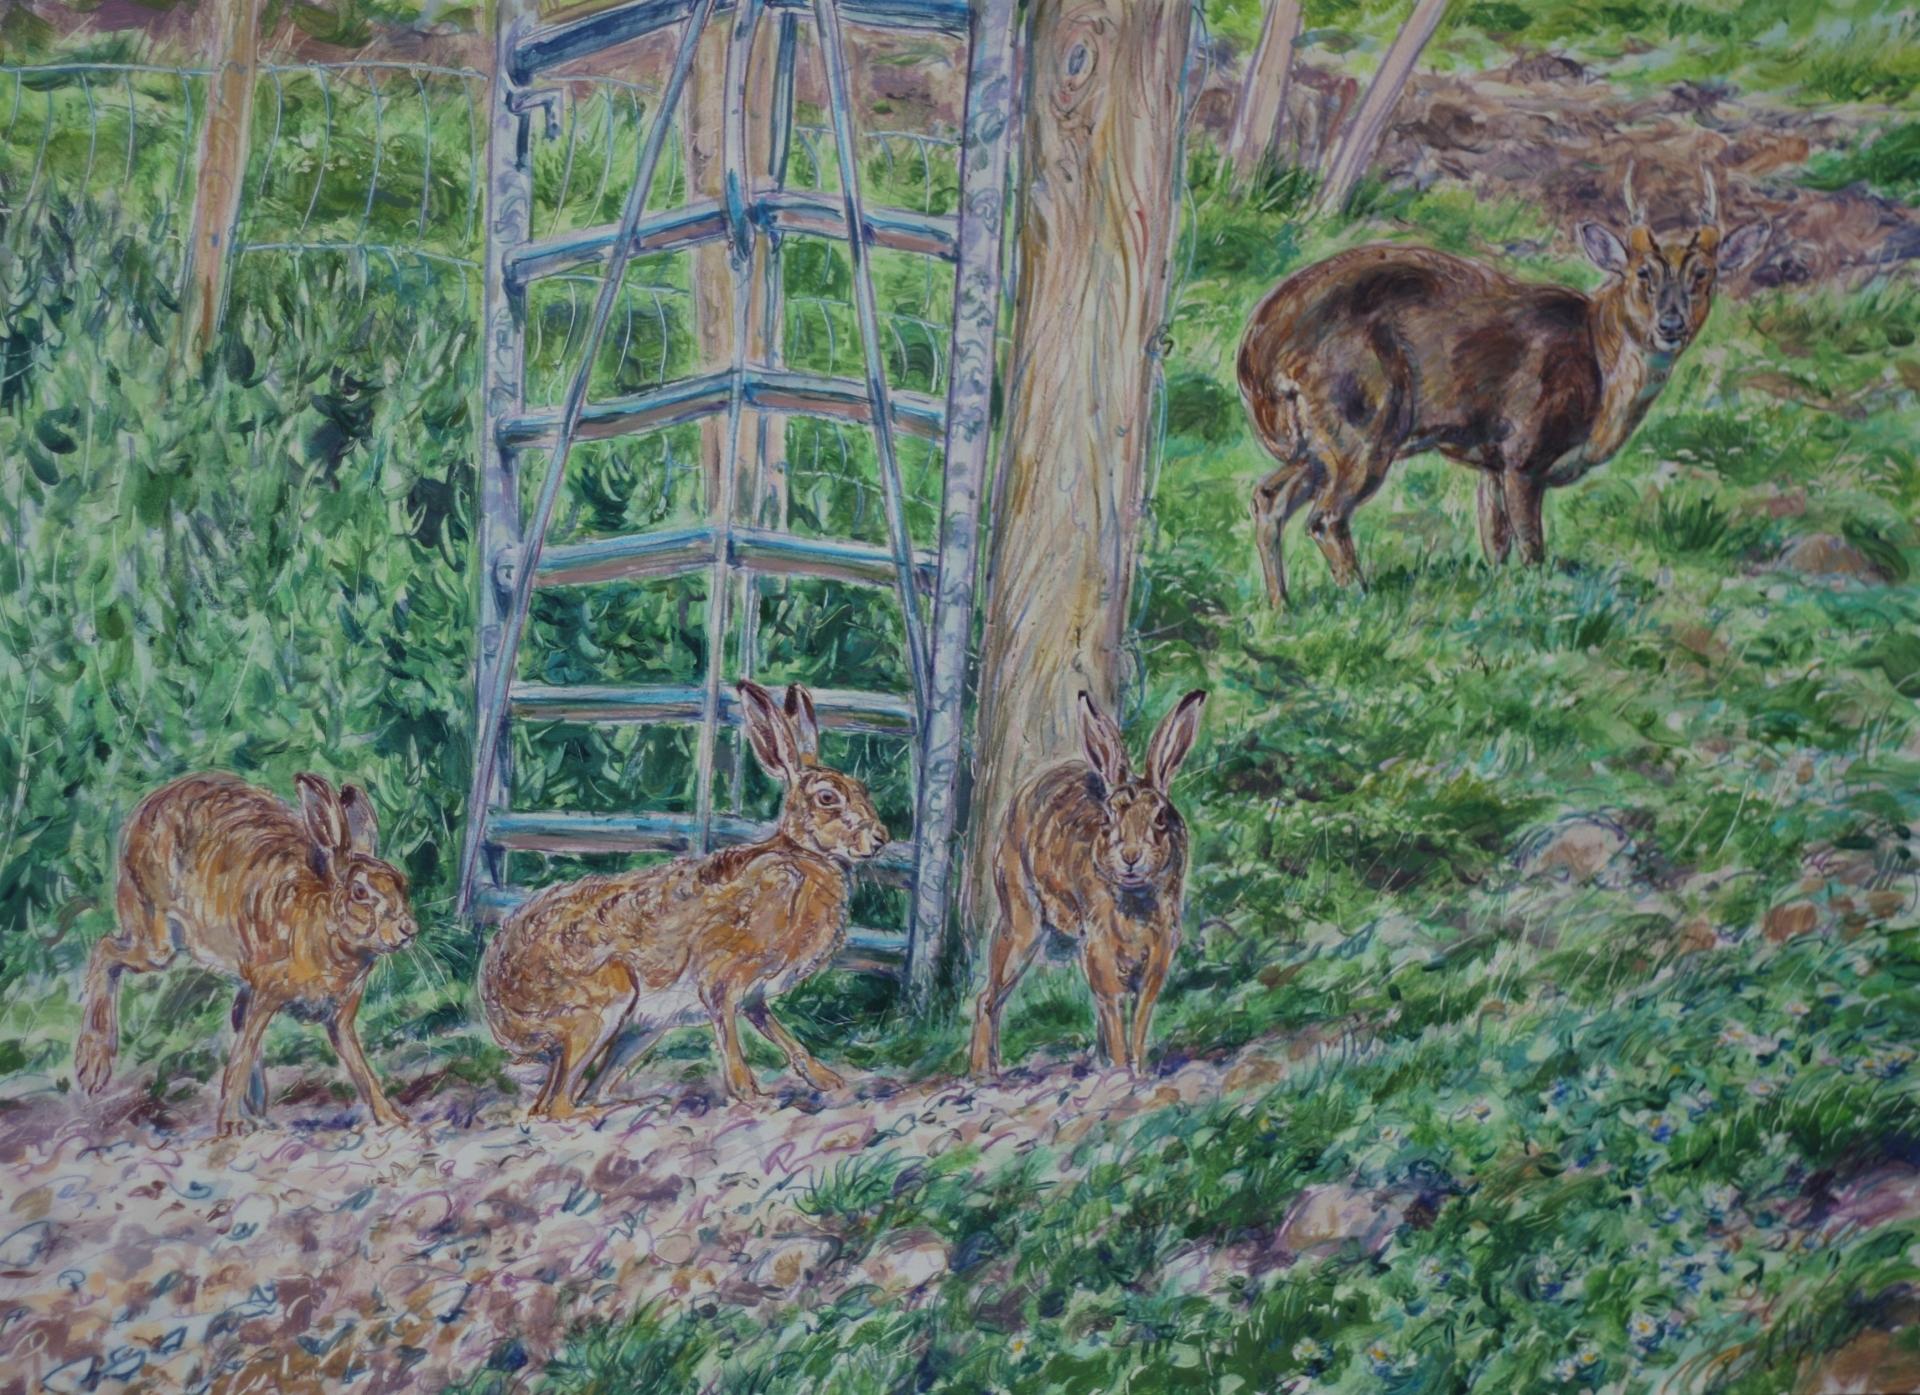 Hares and Muntjac Deer, Stumpshaw Marsh, Norfolk